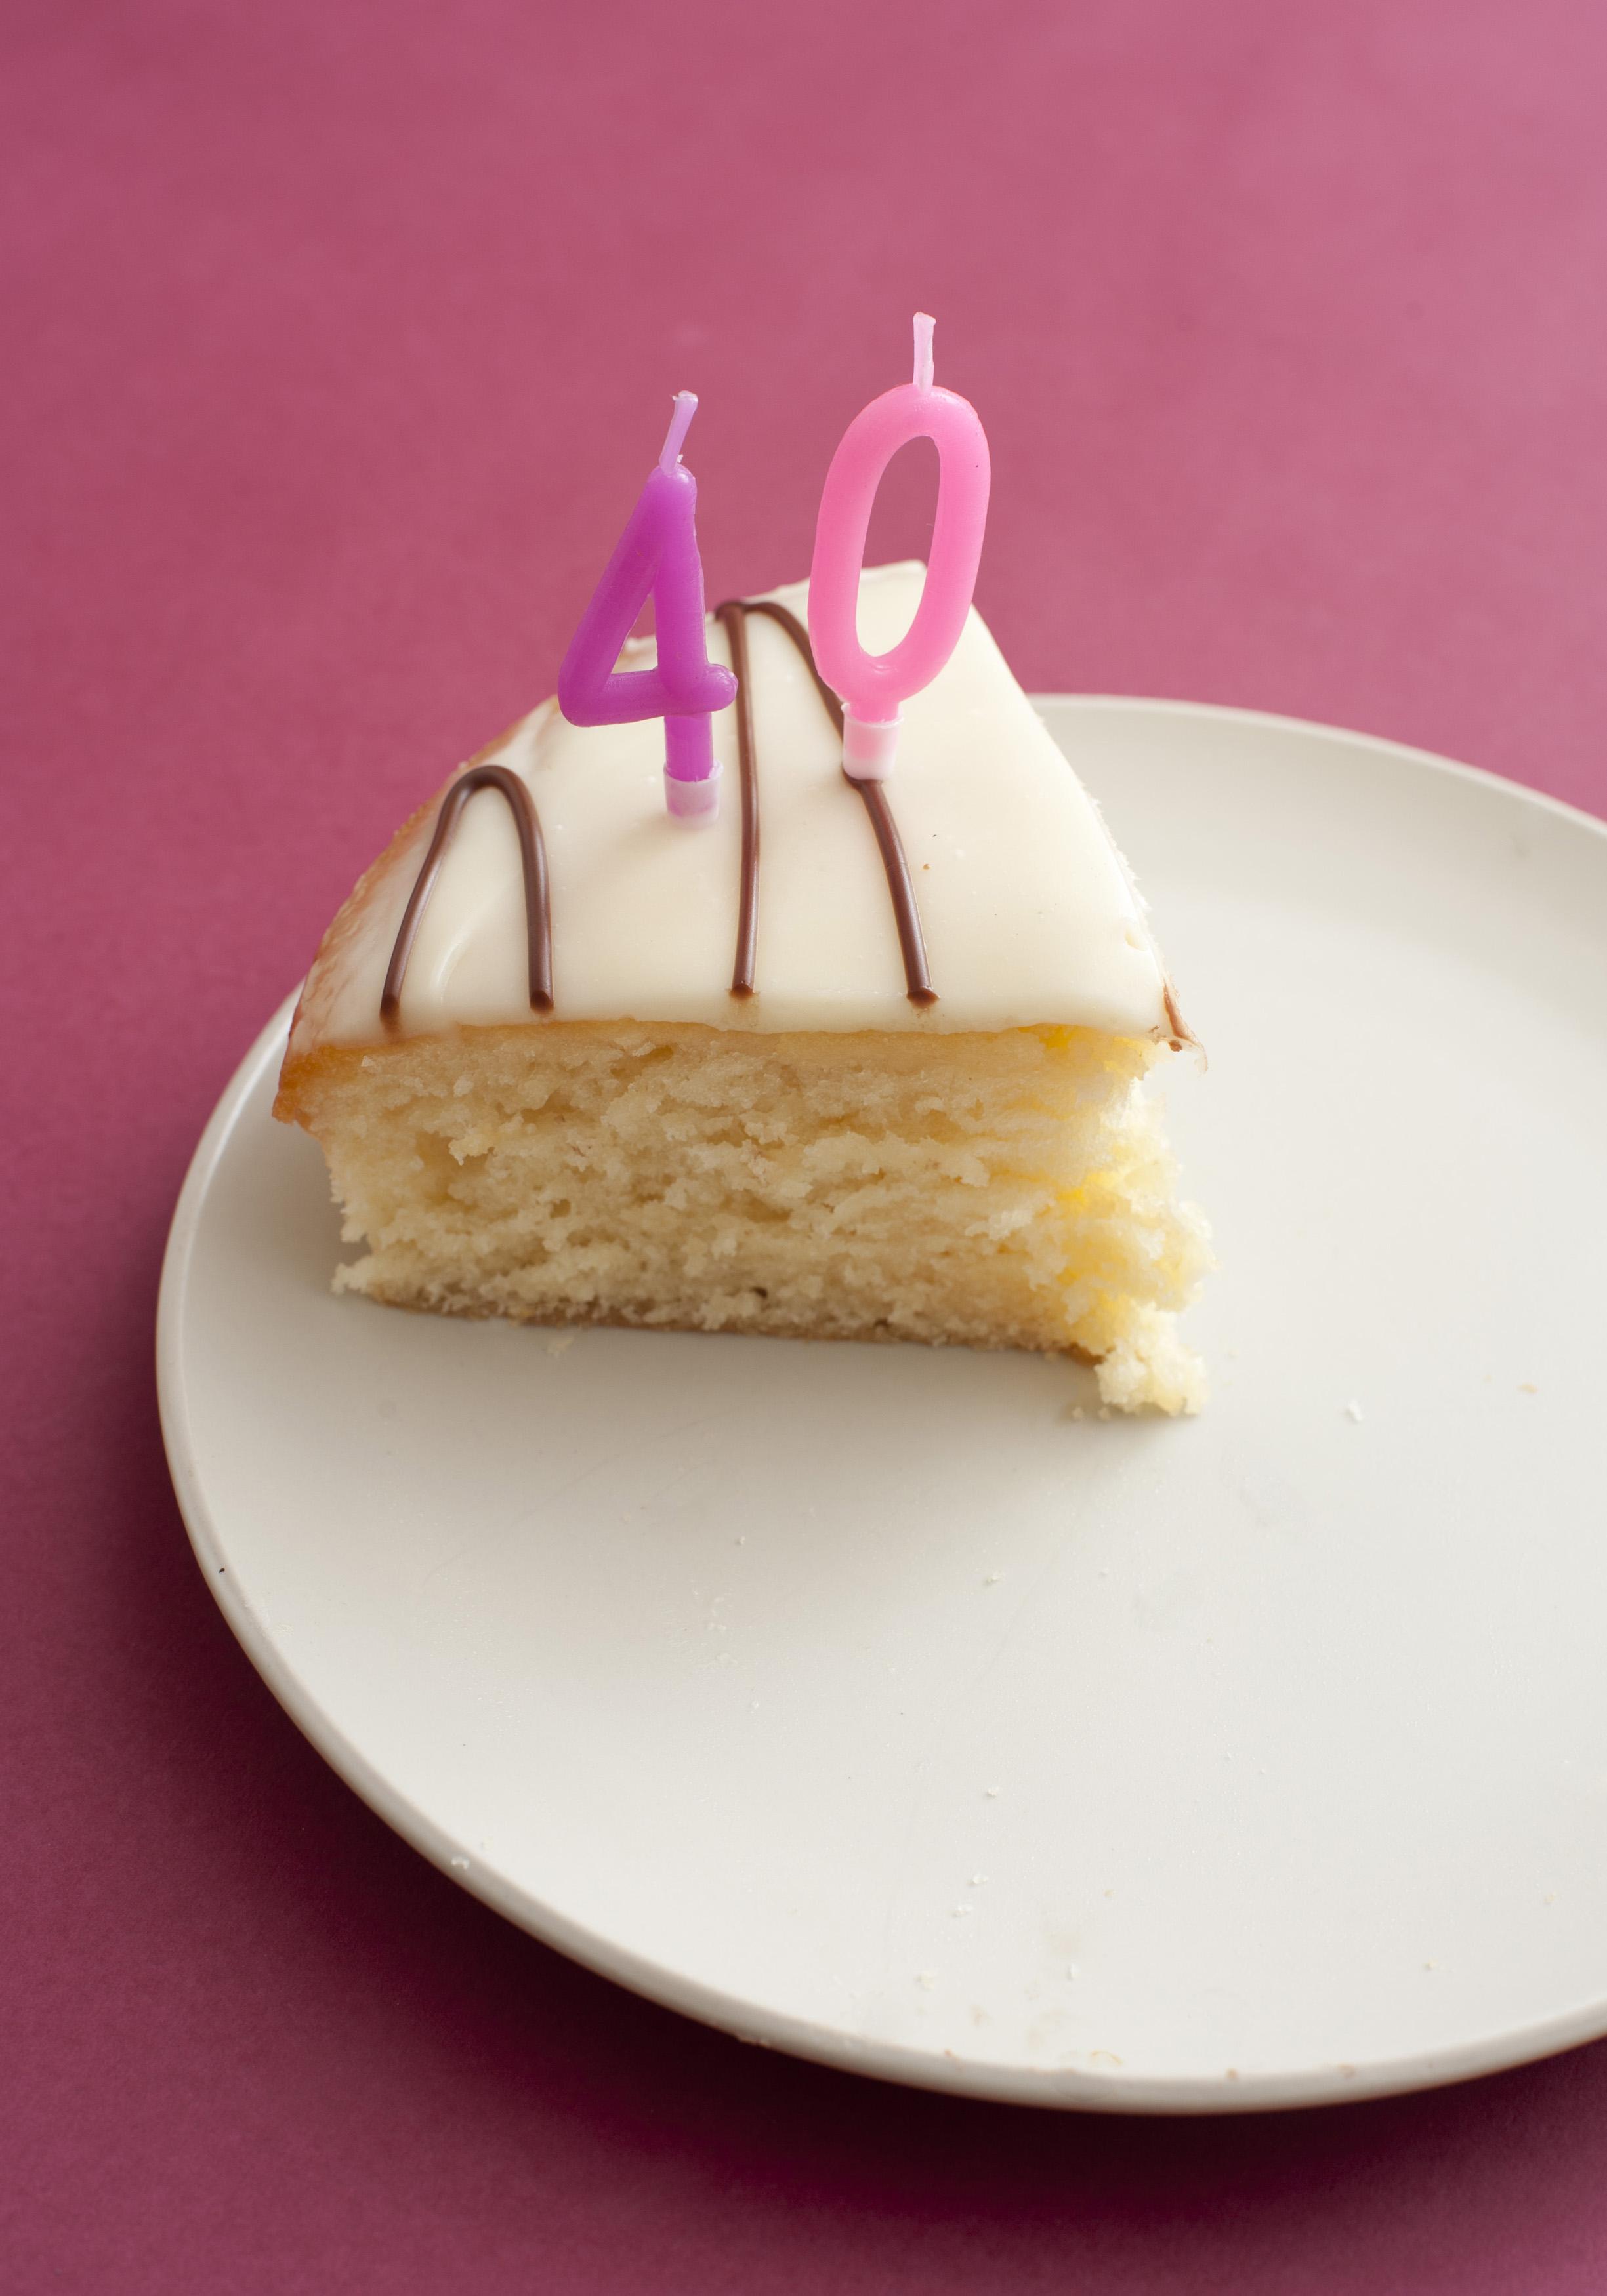 Free Stock Photo 11425 Slice Of 40th Birthday Cake